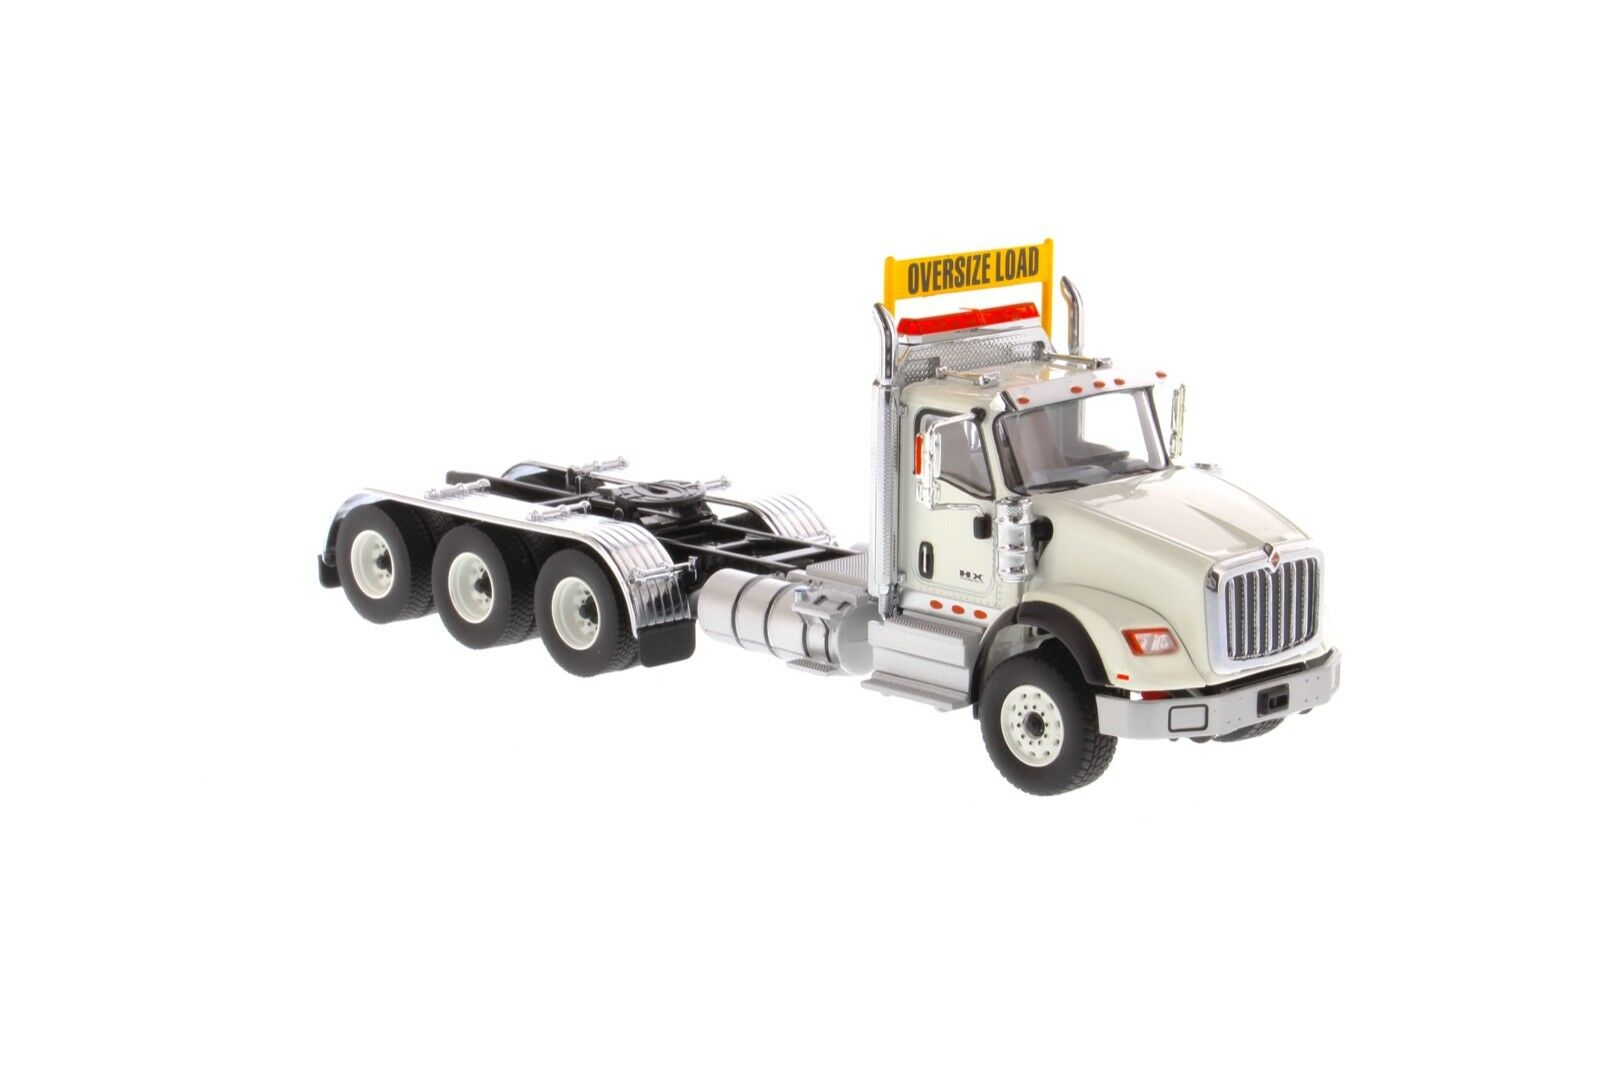 International 1 50 scale HX620 White White White Tridem Tractor - Diecast Masters 71007 4cafc5